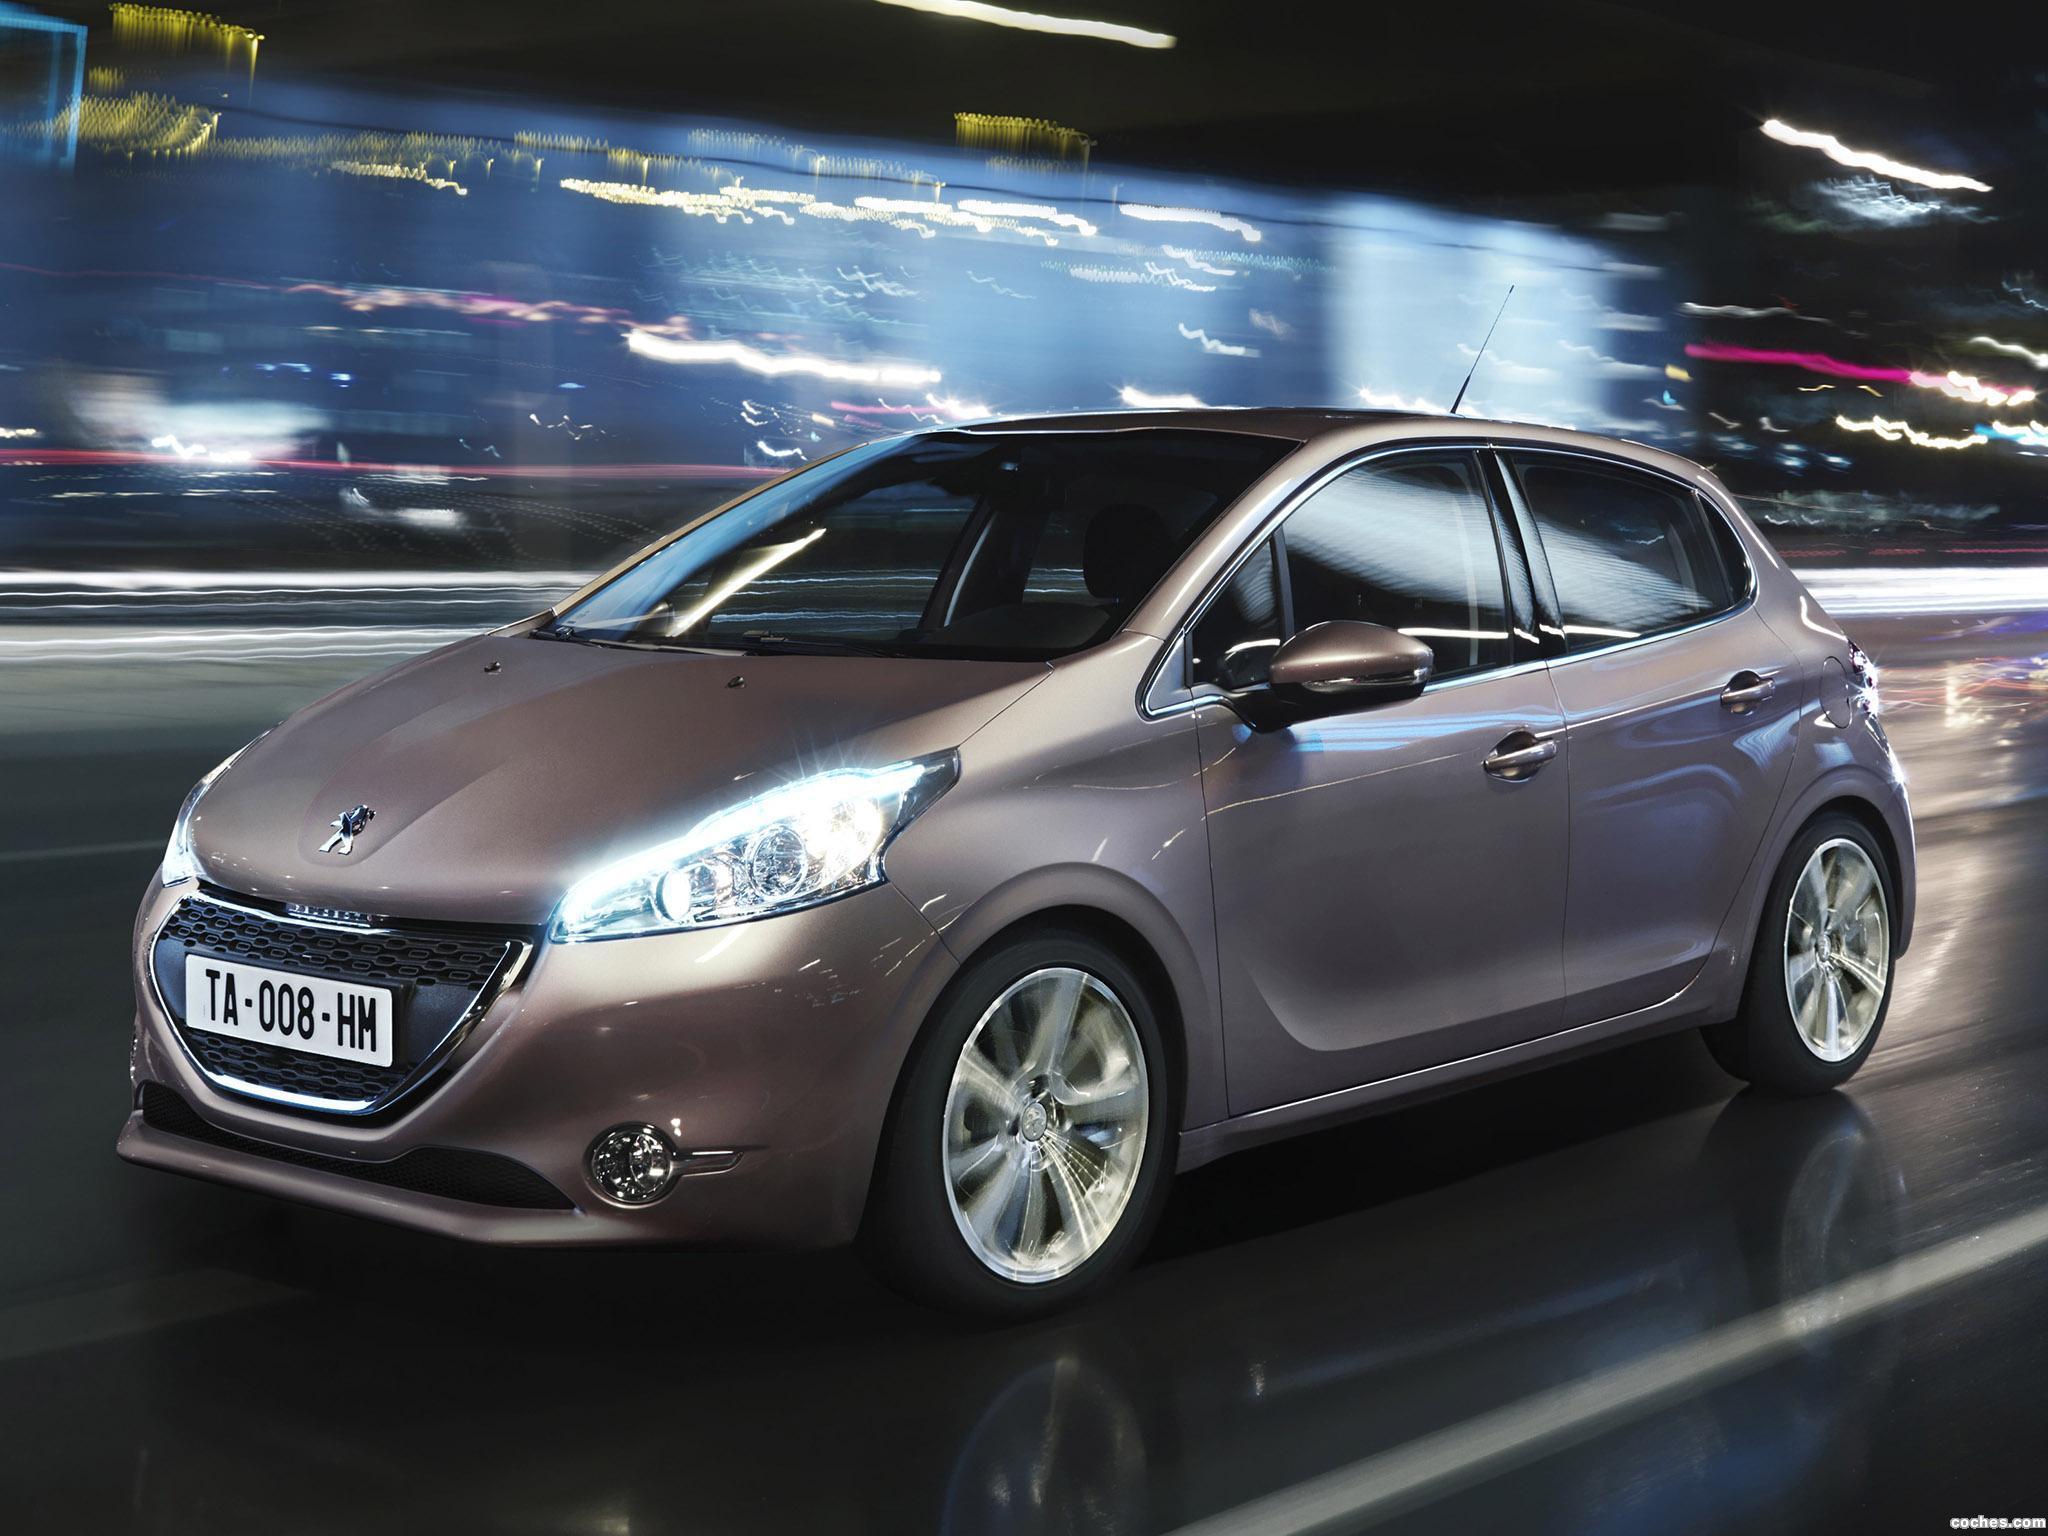 Foto 0 de Peugeot 208 5 puertas 2012